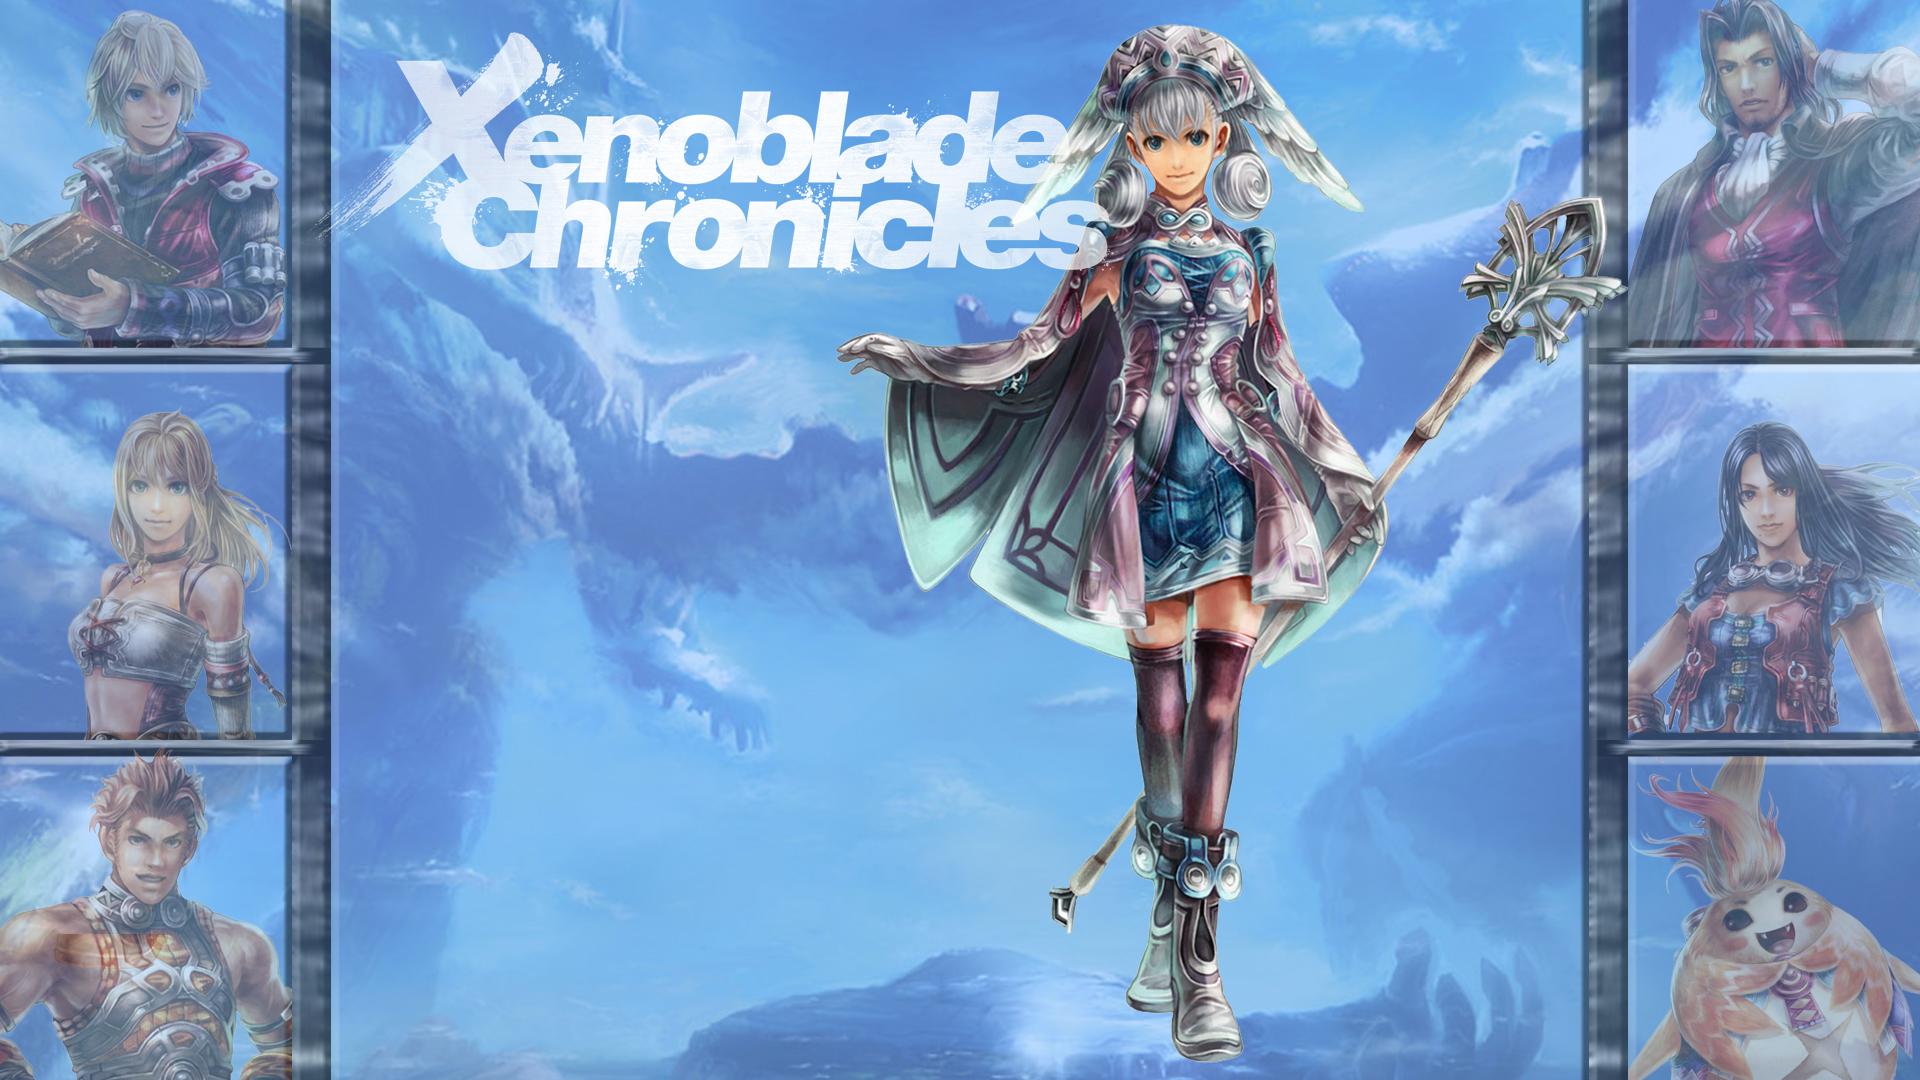 Lucky 7: Xenoblade Chronicles - Melia by MrJechgo on ...